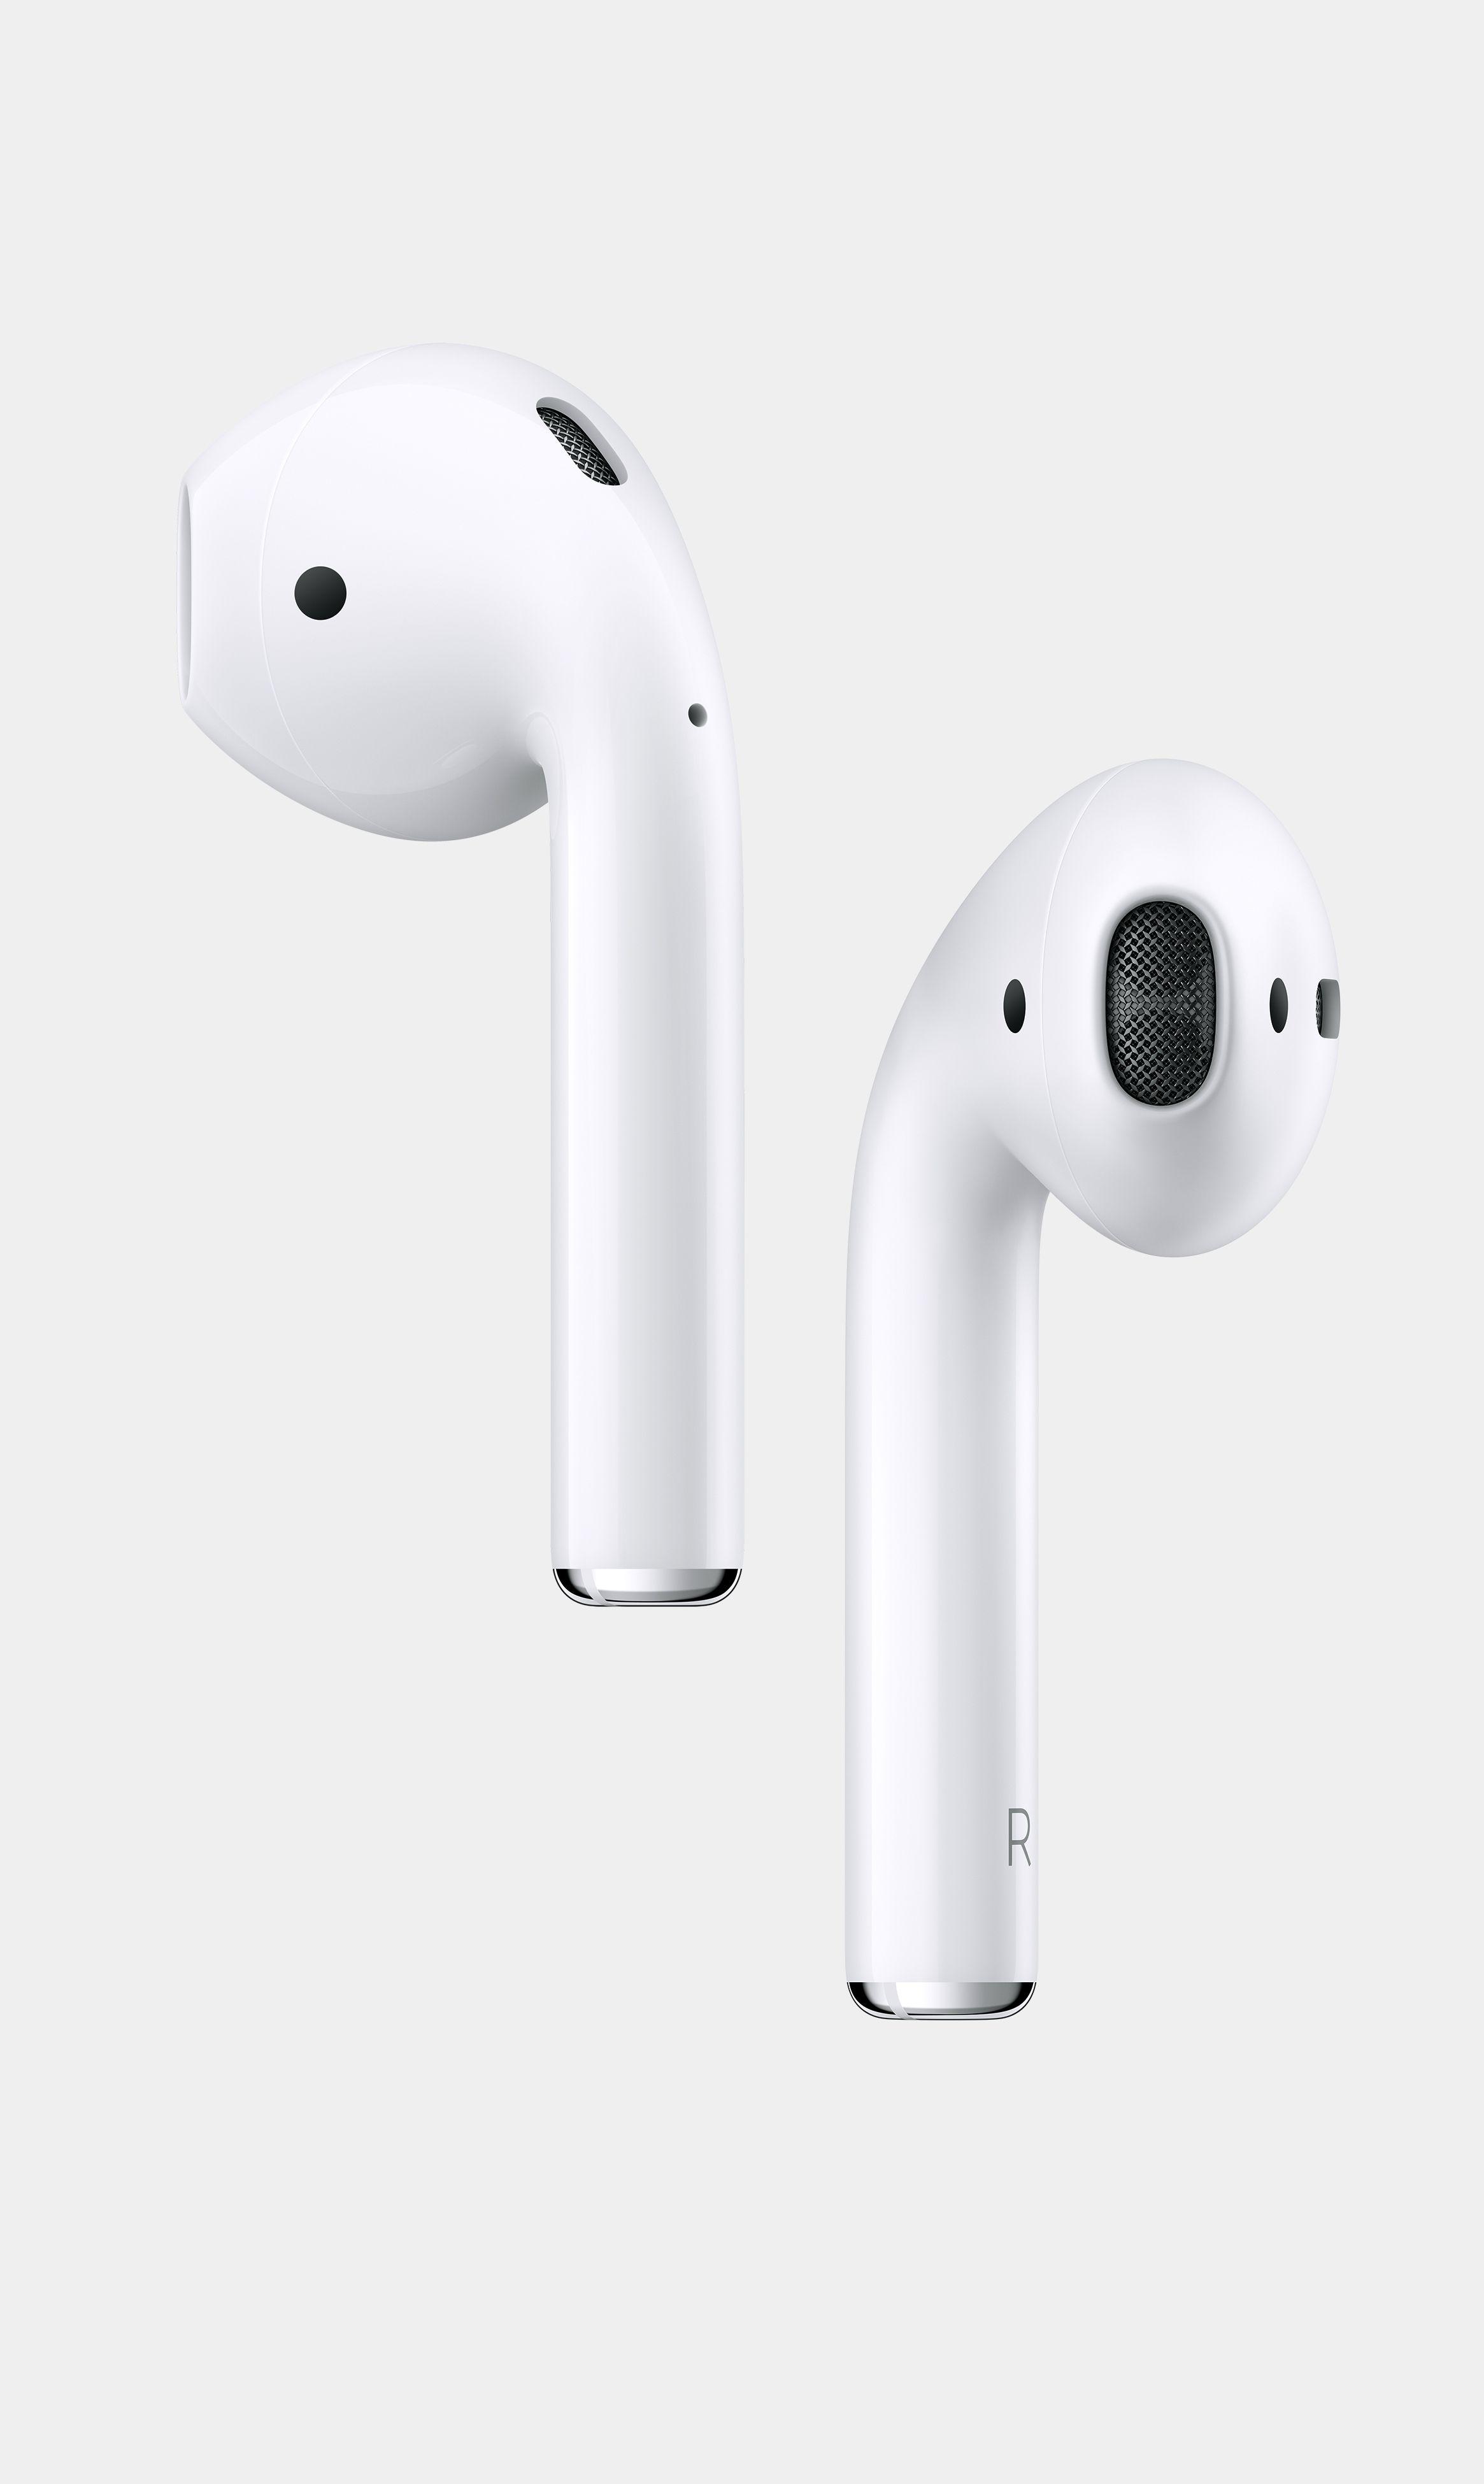 ea50ea962a4 Apple AirPods #tech #digital #ideas #innovation #smart #accessories #gear  #design #futuristic #apple #technology #phone